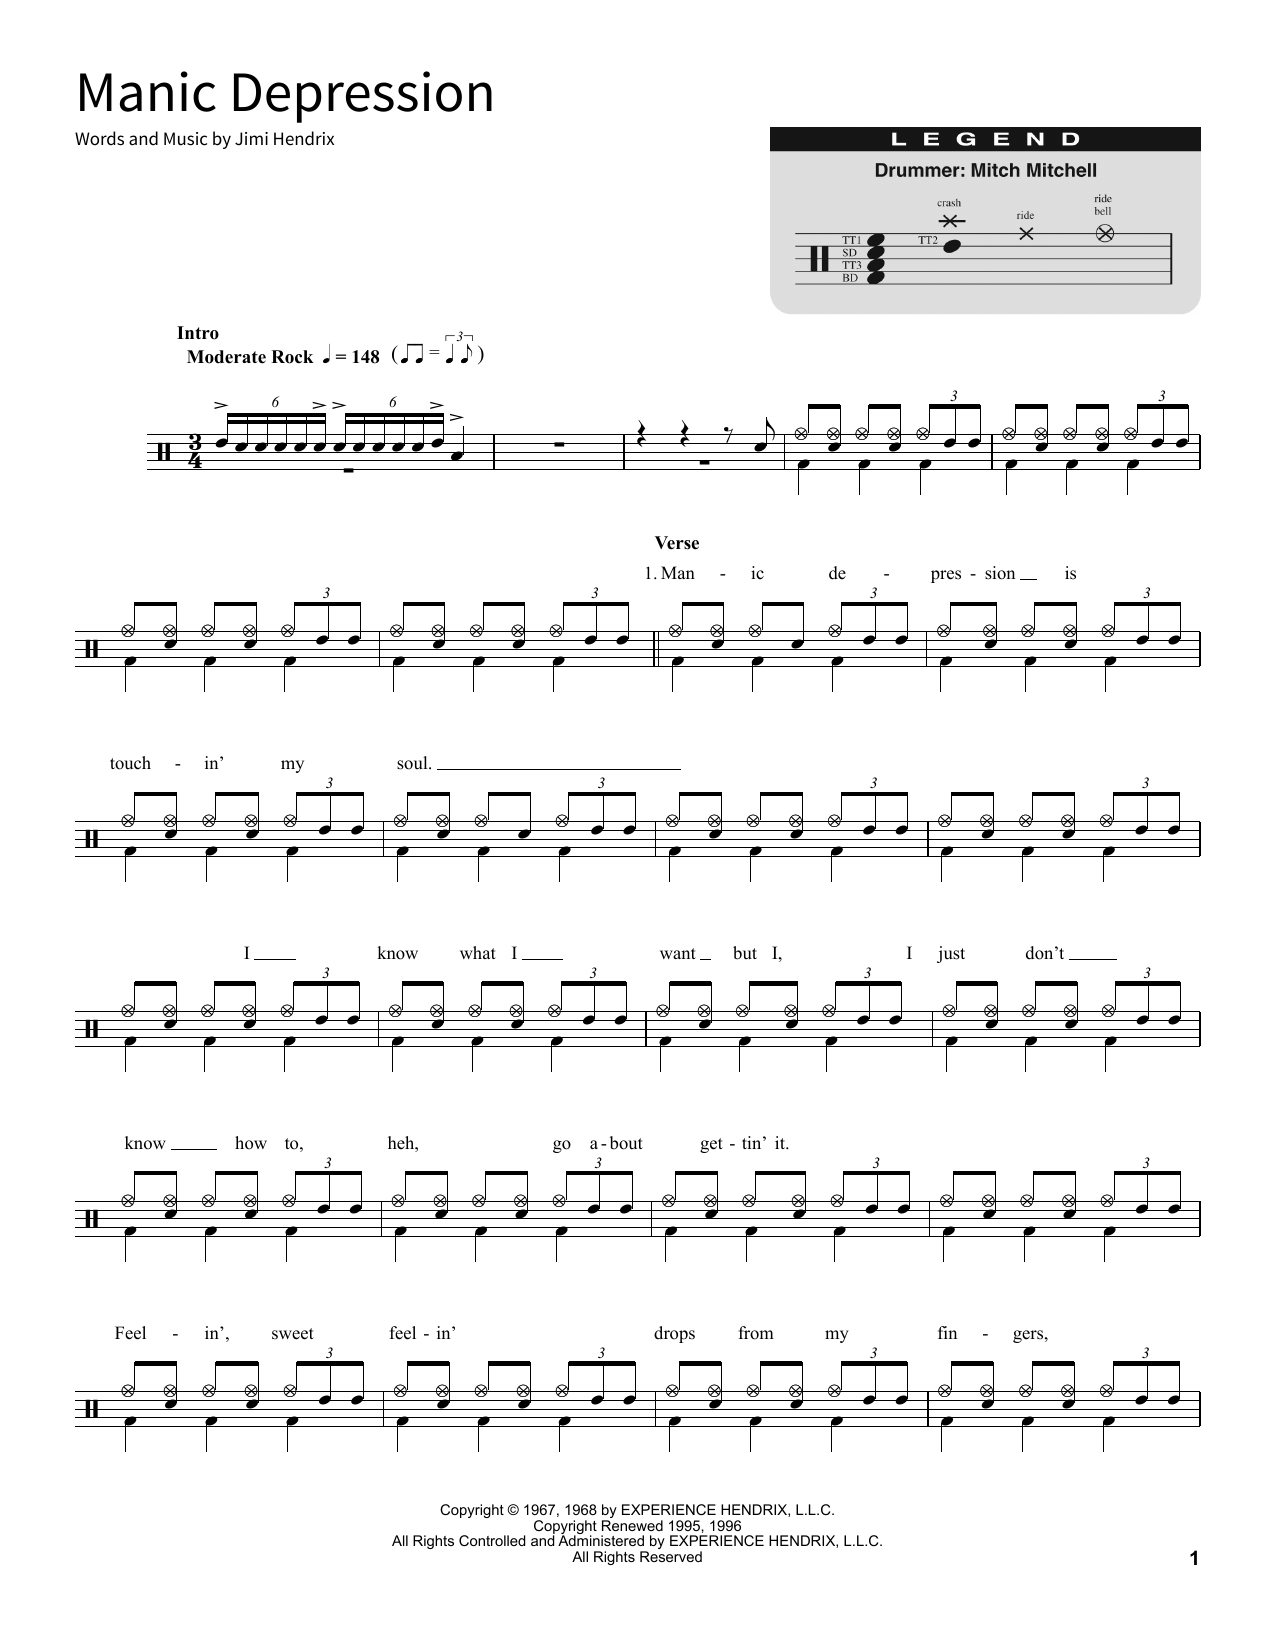 Manic Depression Sheet Music